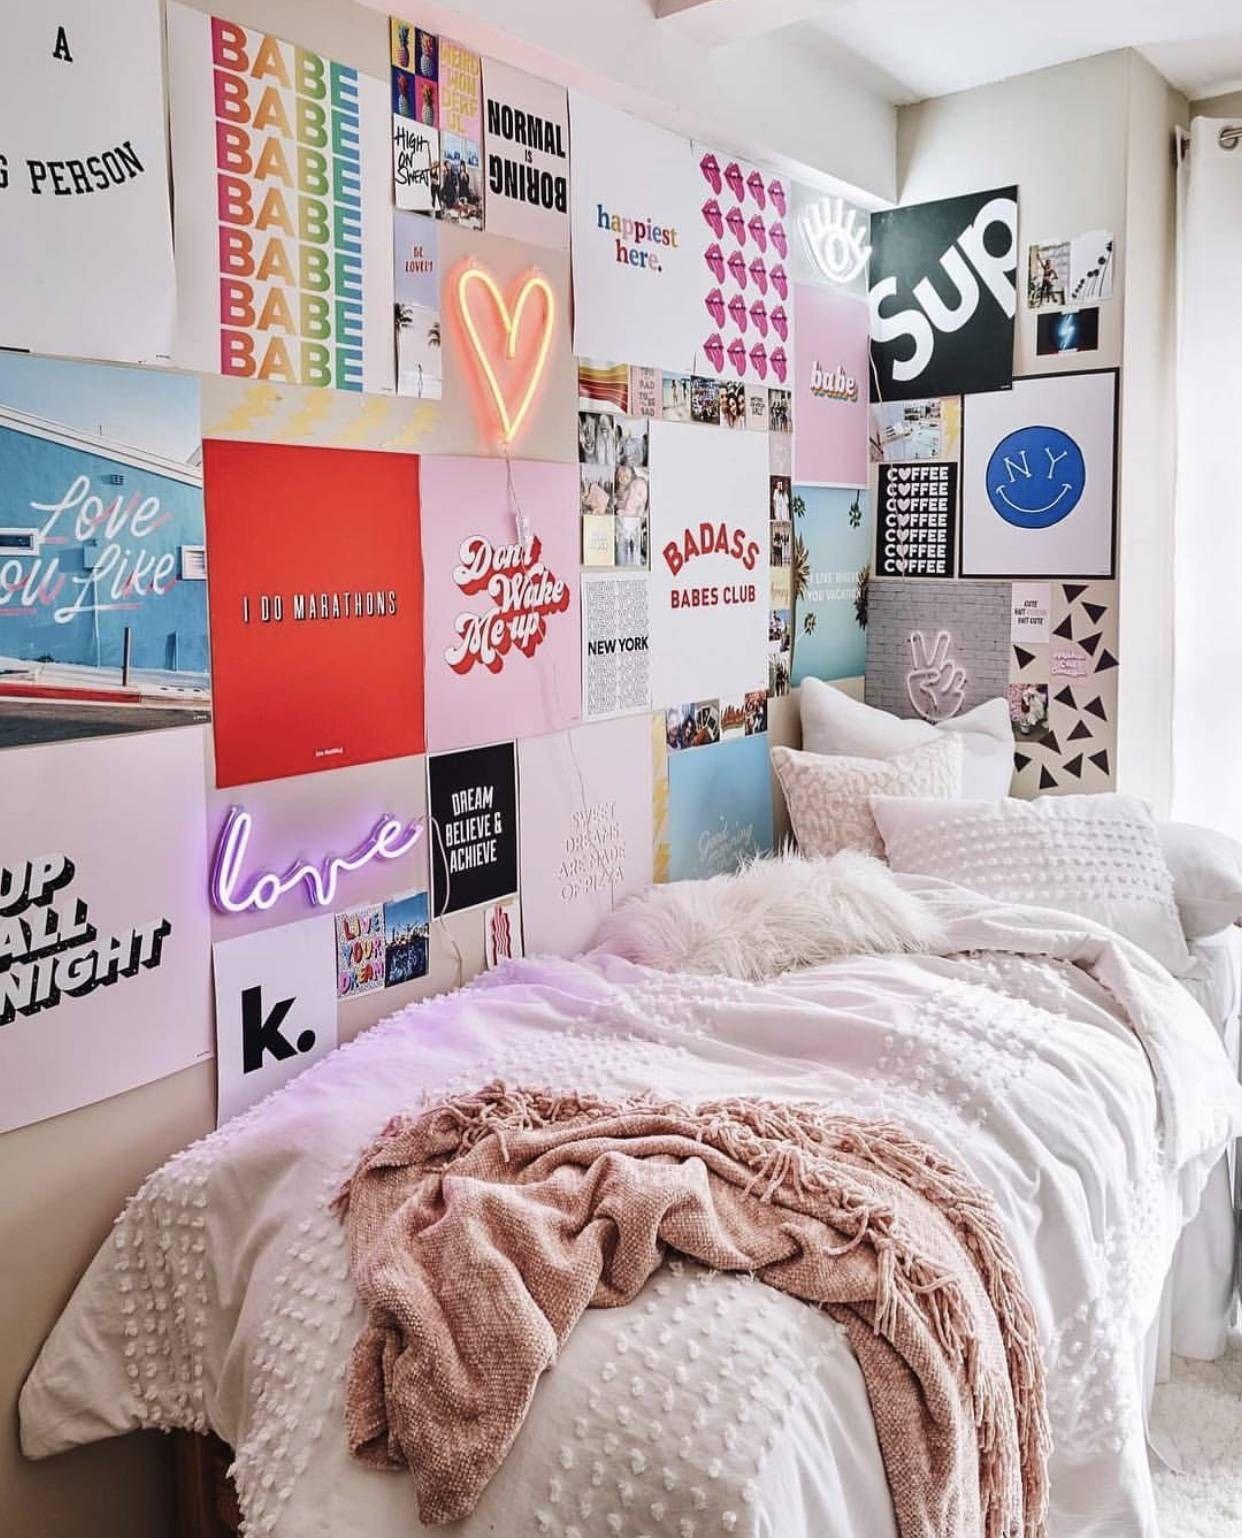 VSCO Room Ideas: How to Create a Cute Vsco Room - The Pink Dream